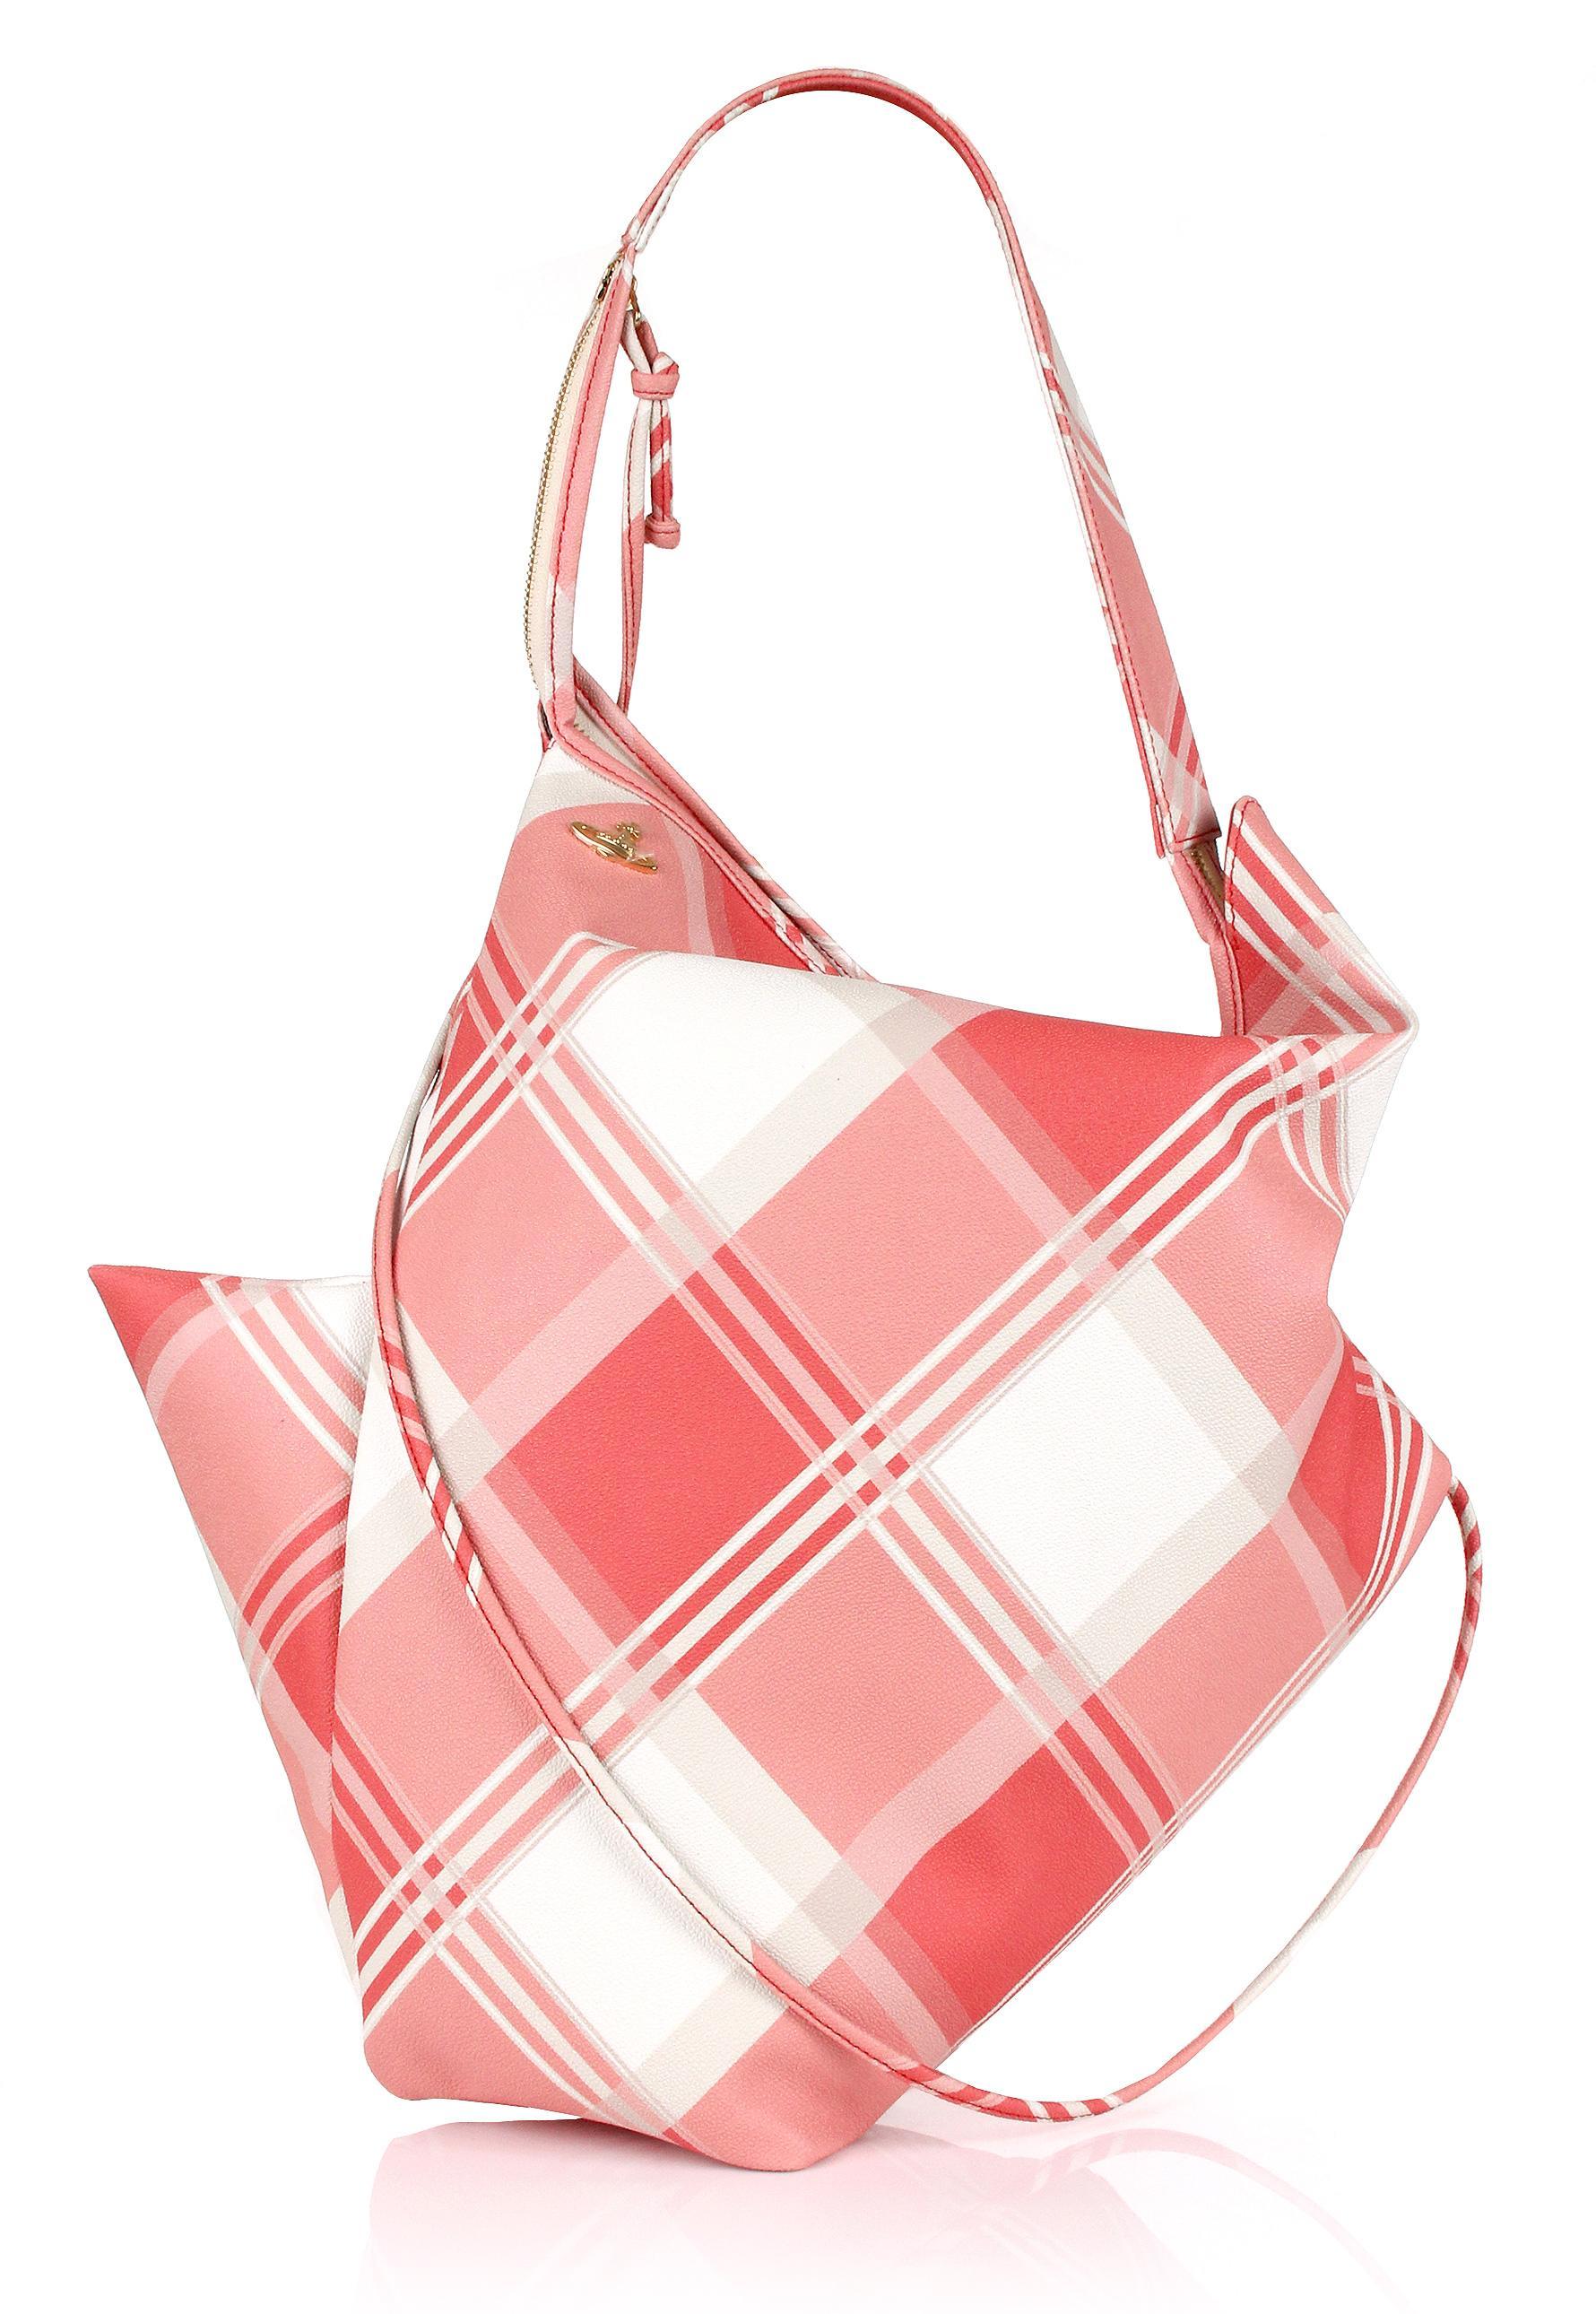 0a2c5e8359 Vivienne Westwood Derby 7112 Vivienne's Bag Mac Beata in Pink - Lyst